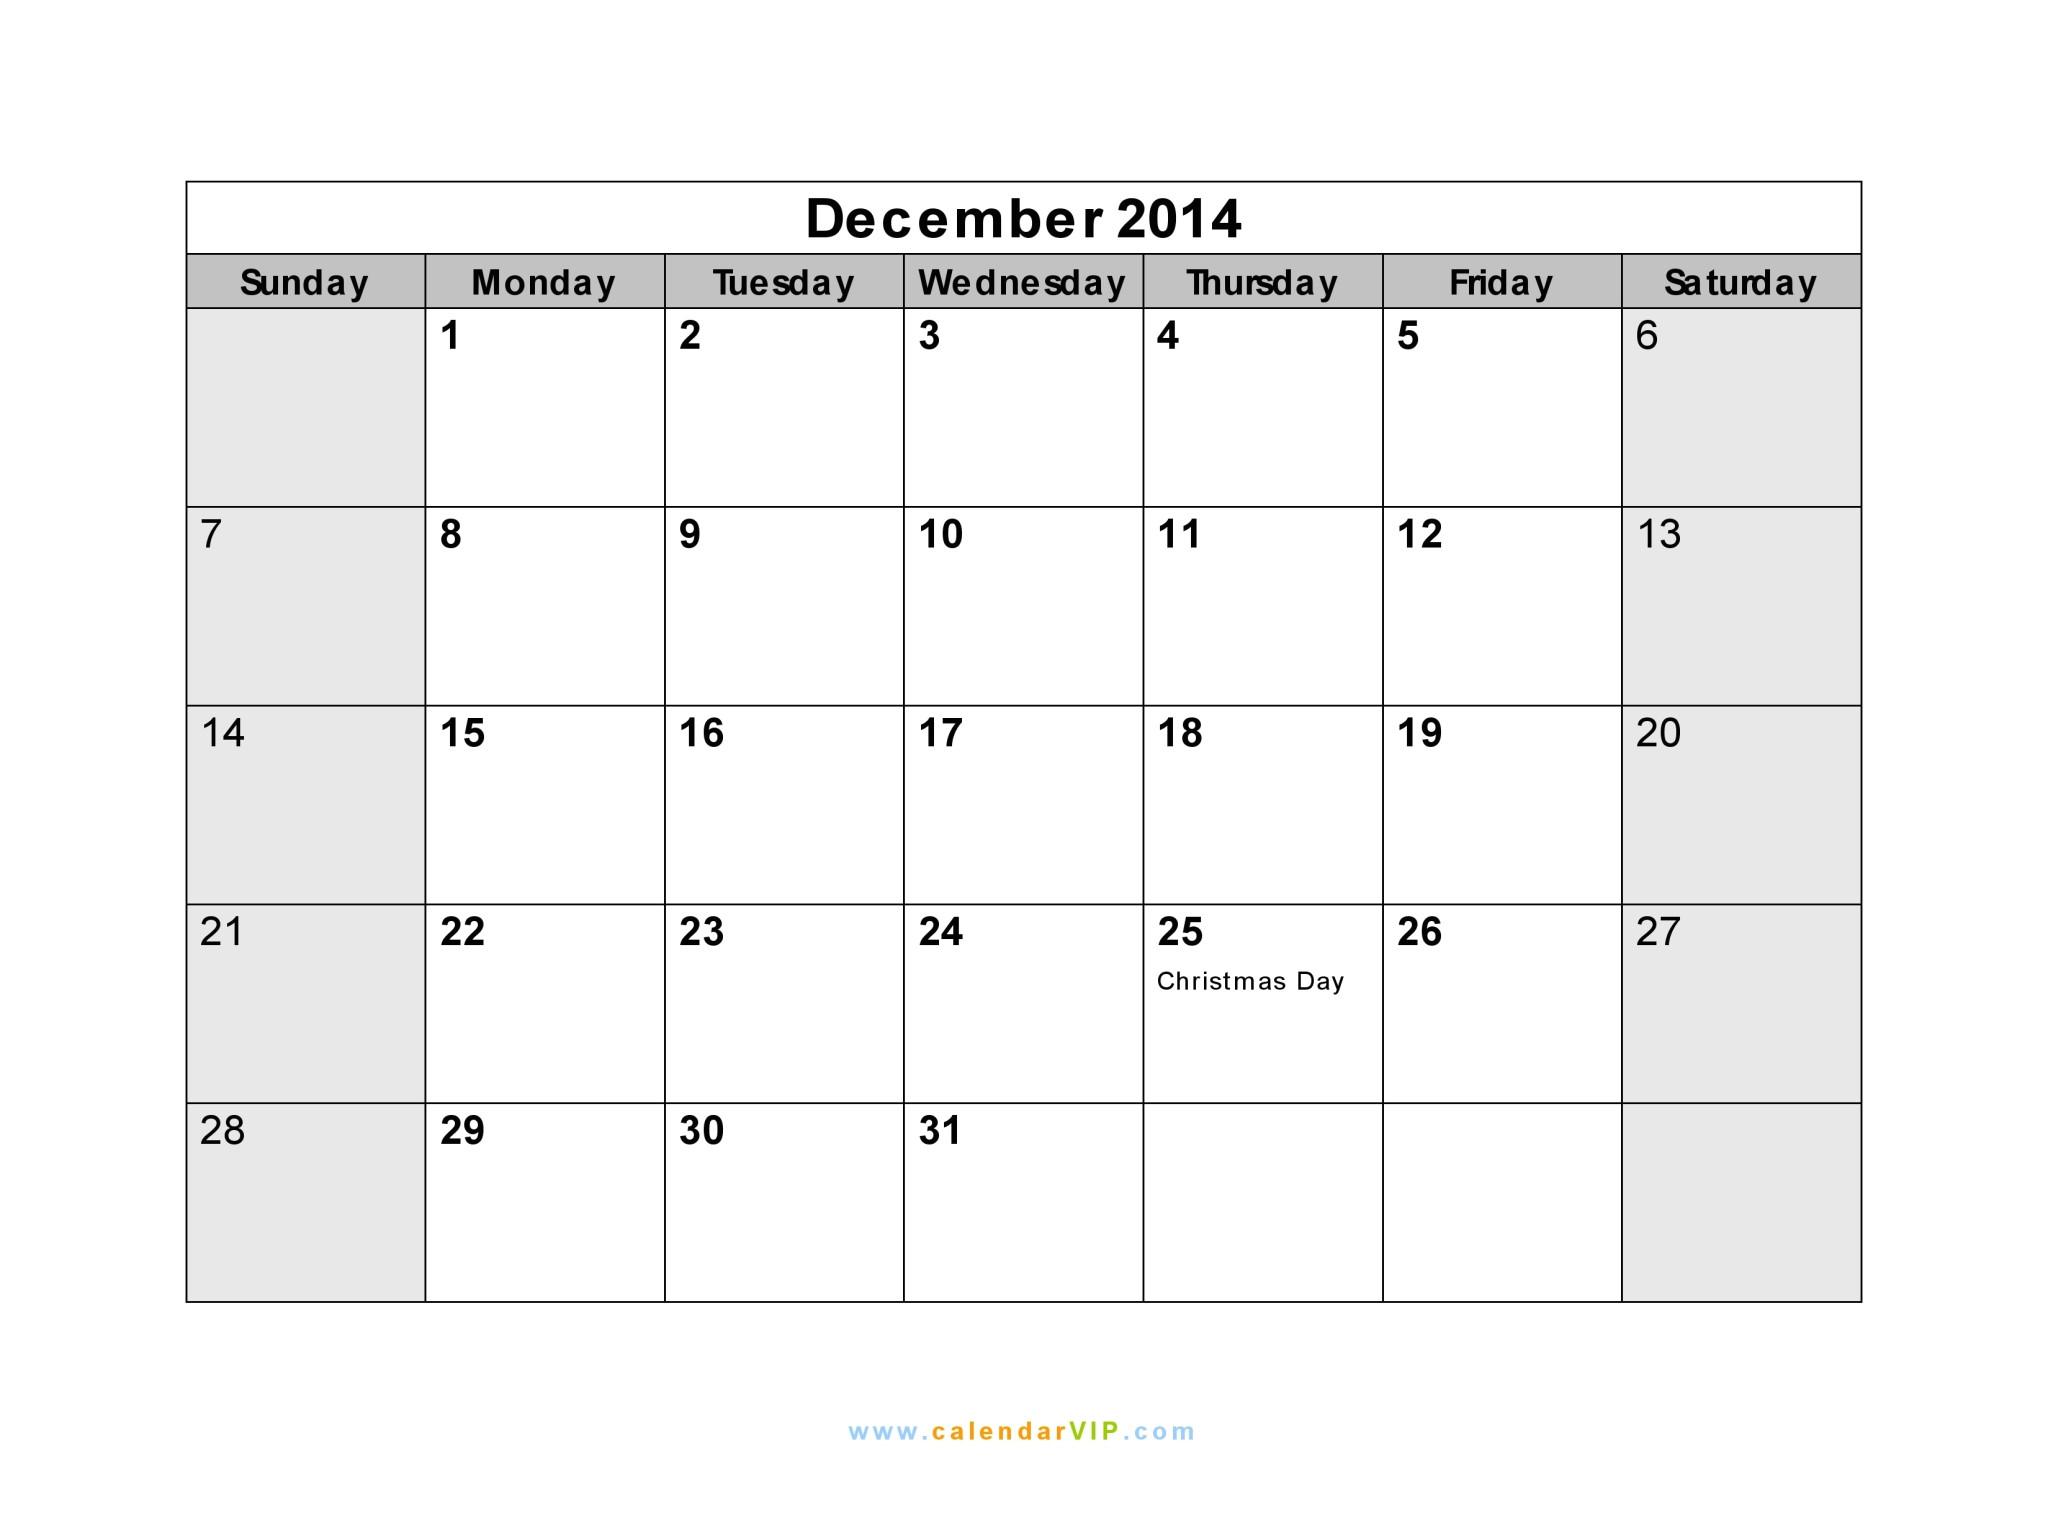 Blank December 2014 Calendar Template Calendar Dec 2014 Driverlayer Search Engine